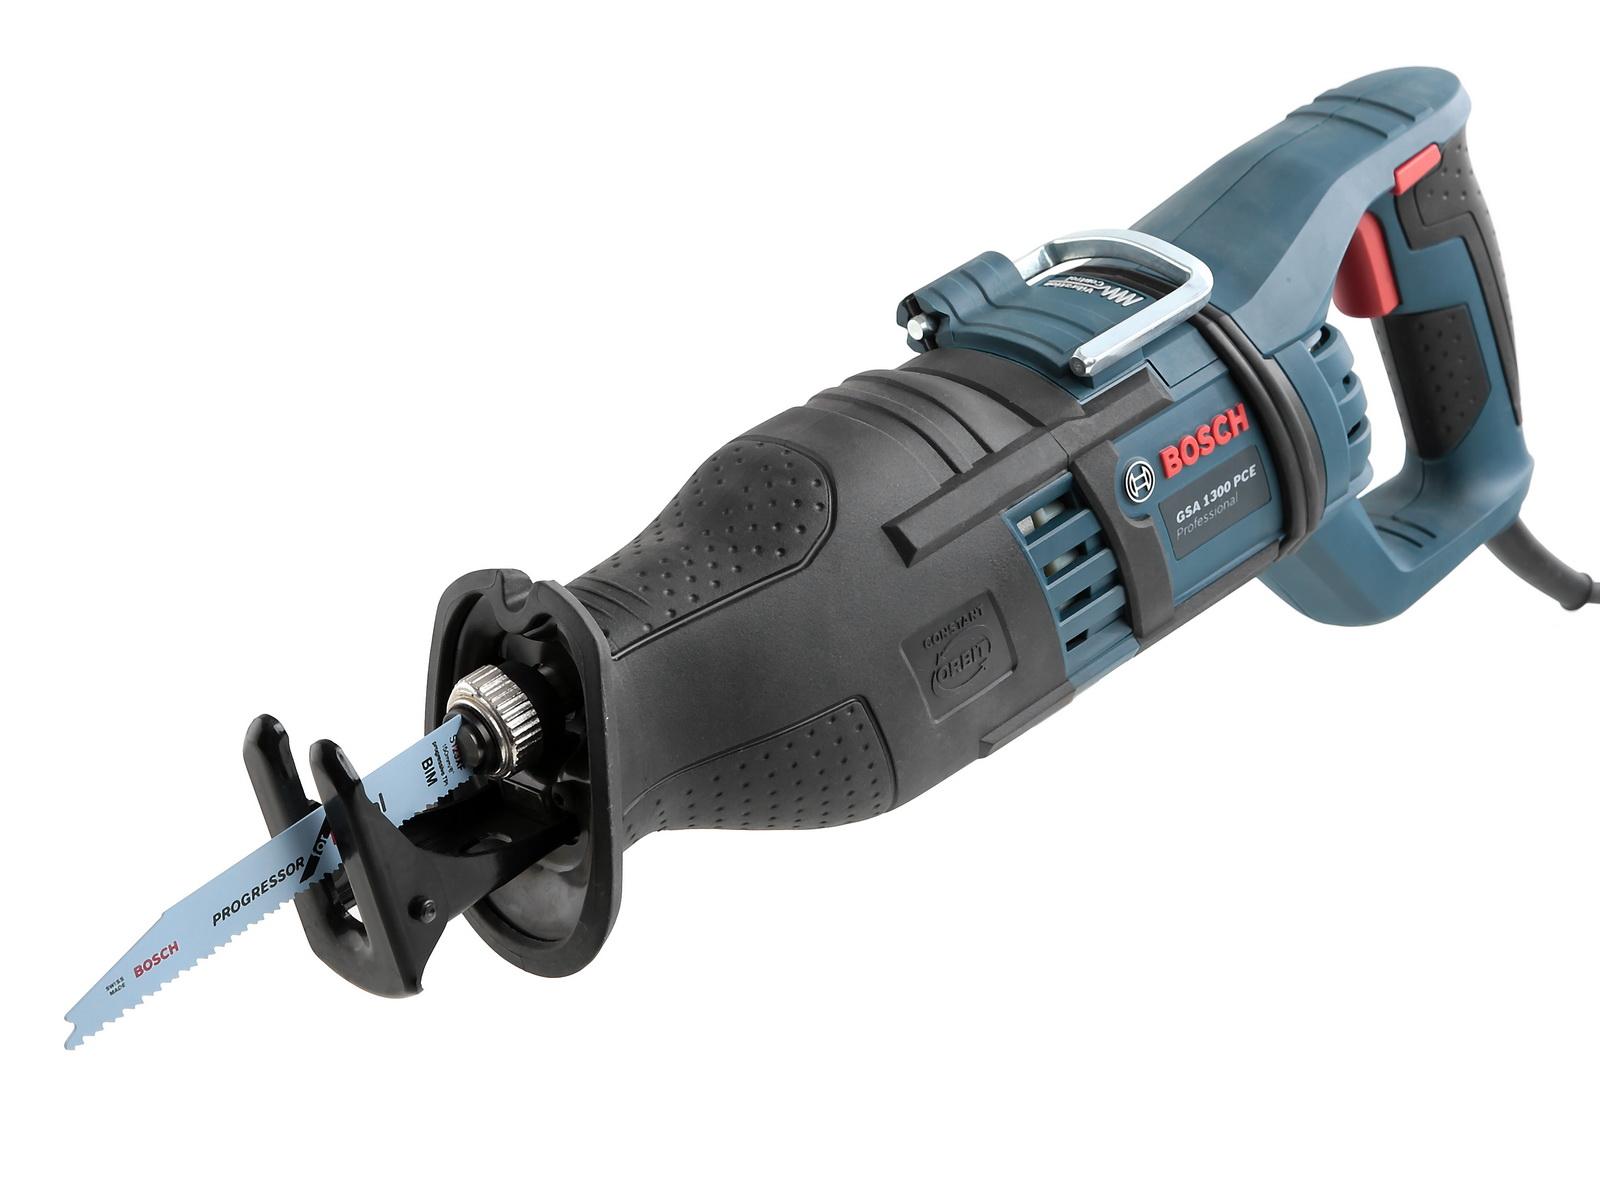 Сабельная пила Bosch Gsa 1300 pce (0.601.64e.200) аккумуляторная сабельная ножовка bosch gsa 10 8v li 0 601 64l 902